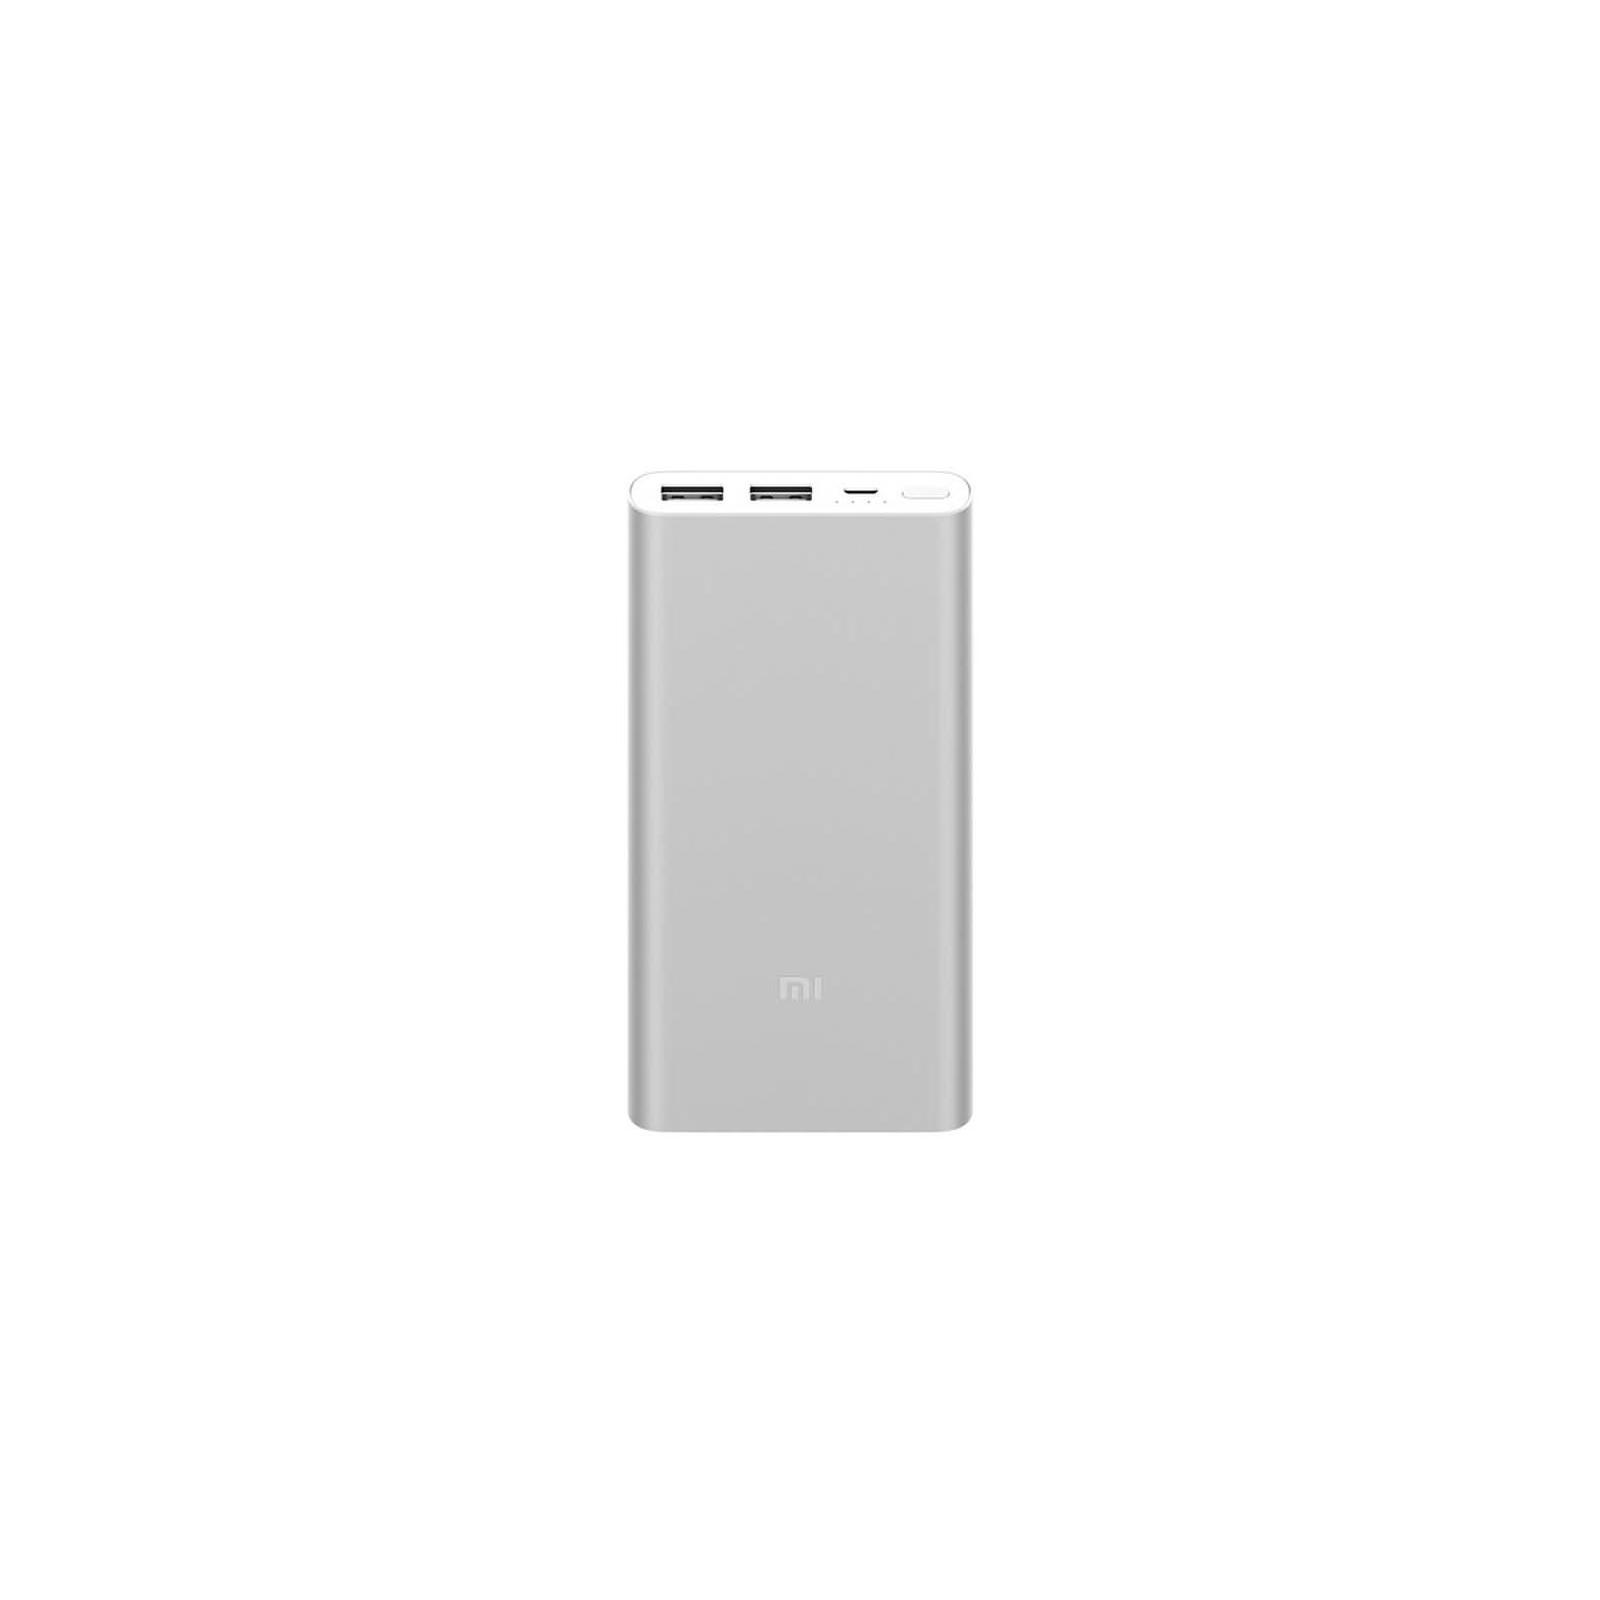 Батарея универсальная Xiaomi Mi Power Bank 2S 10000 mAh QC2.0(2.4A,2USB) (PLM09ZM) Silver (VXN4231GL / VXN4228CN)